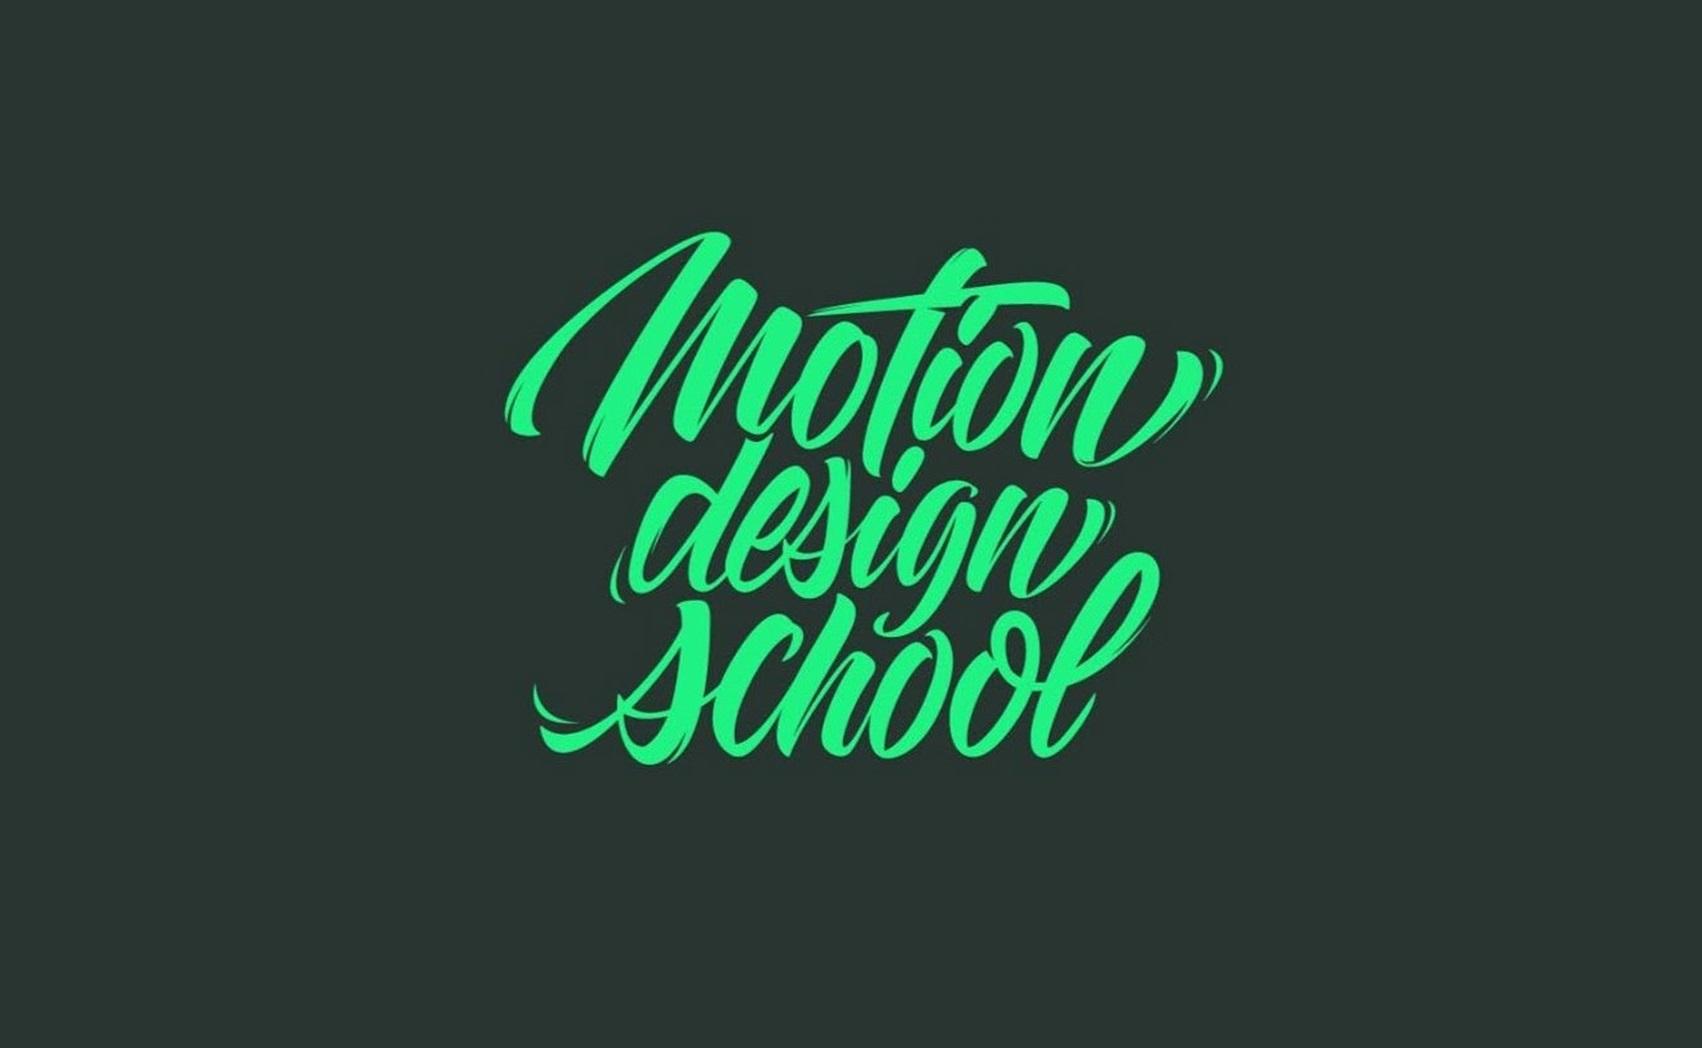 Motion Design School Courses